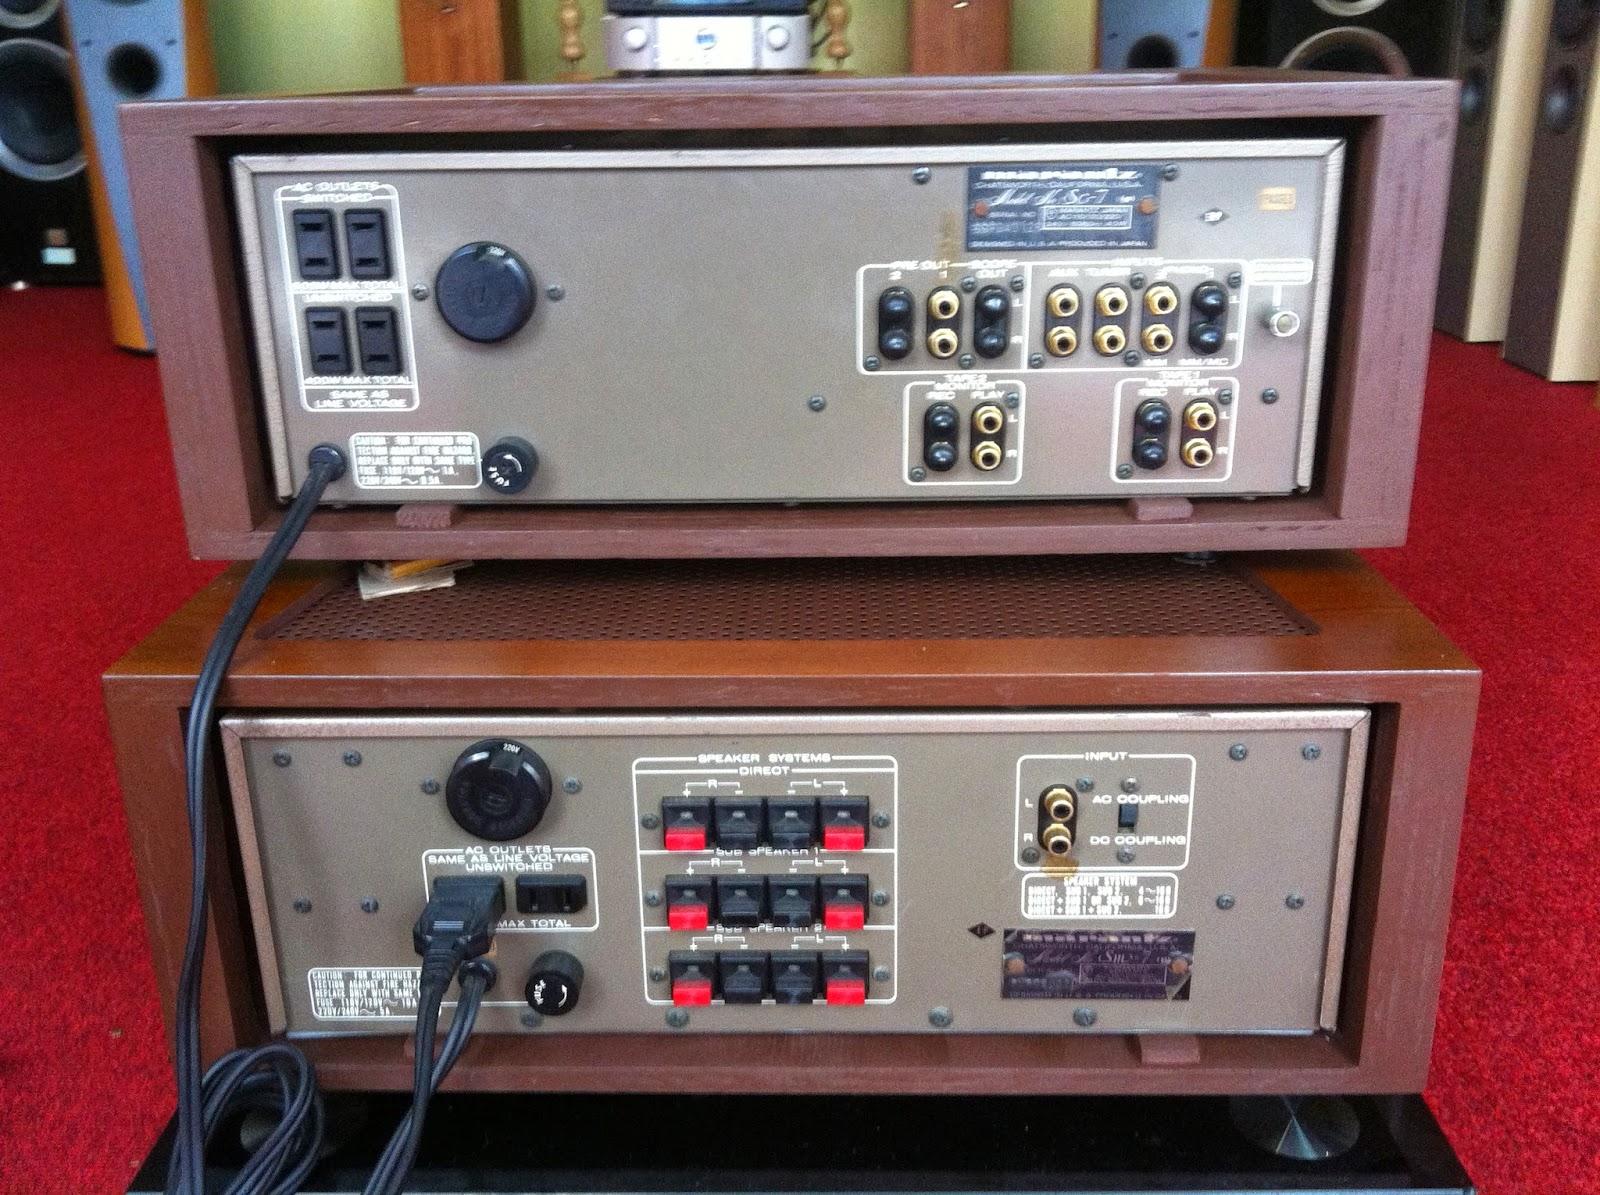 Mặt sau cặp amply Marantz SC-7&SM7